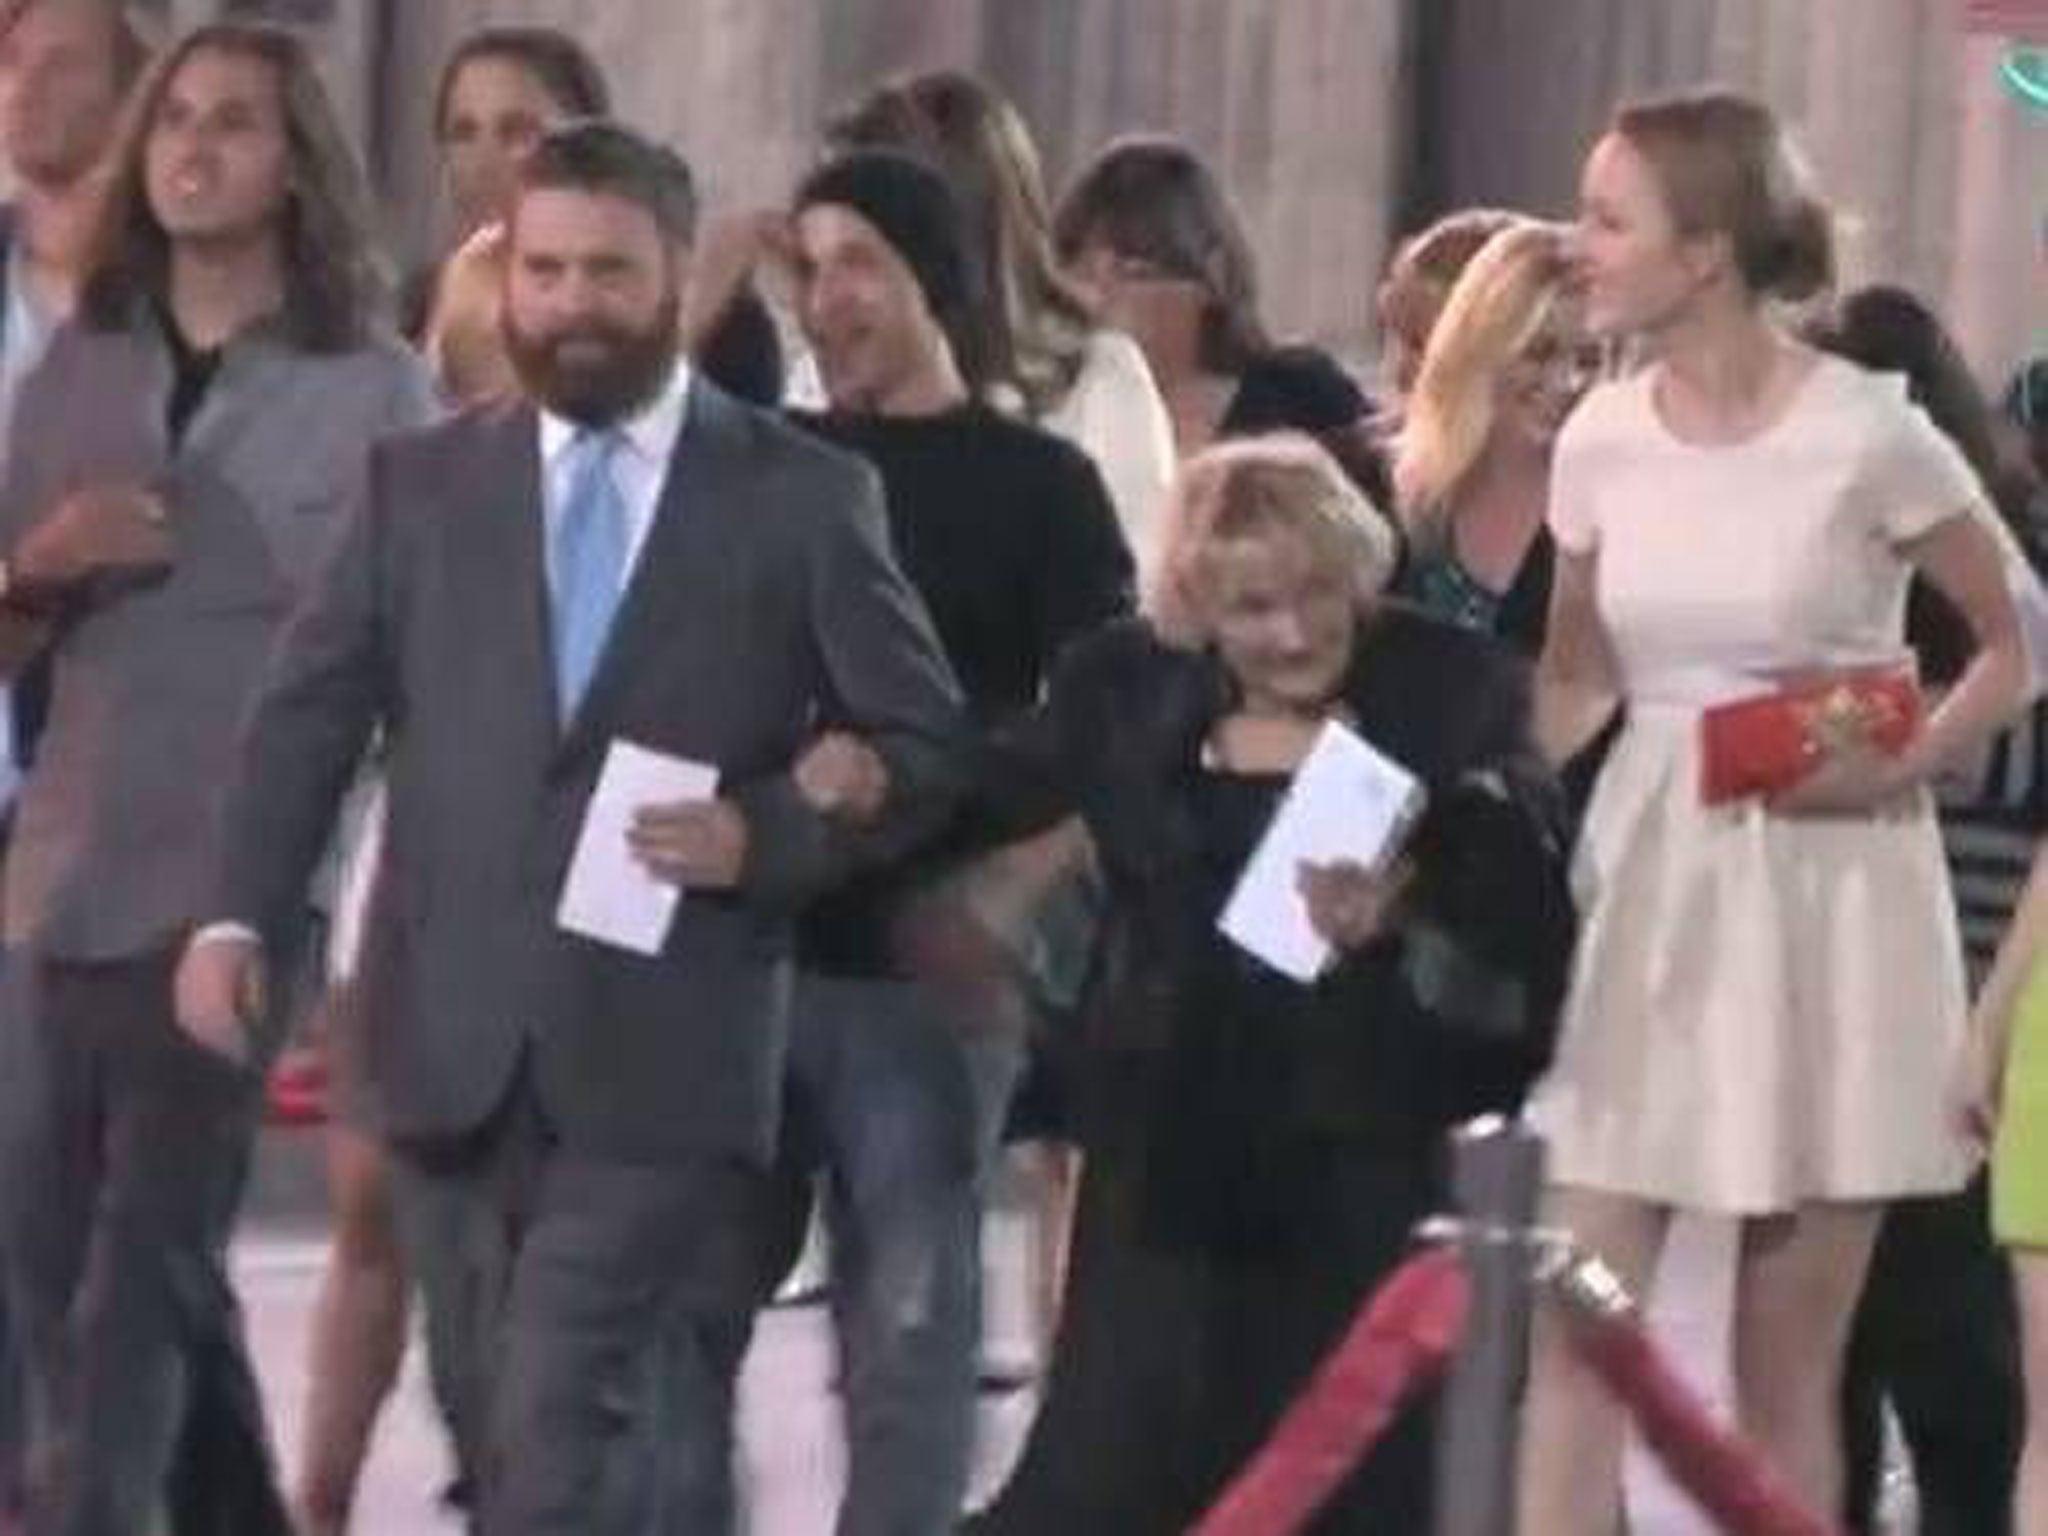 Zach Halifianakis saved a homeless old woman